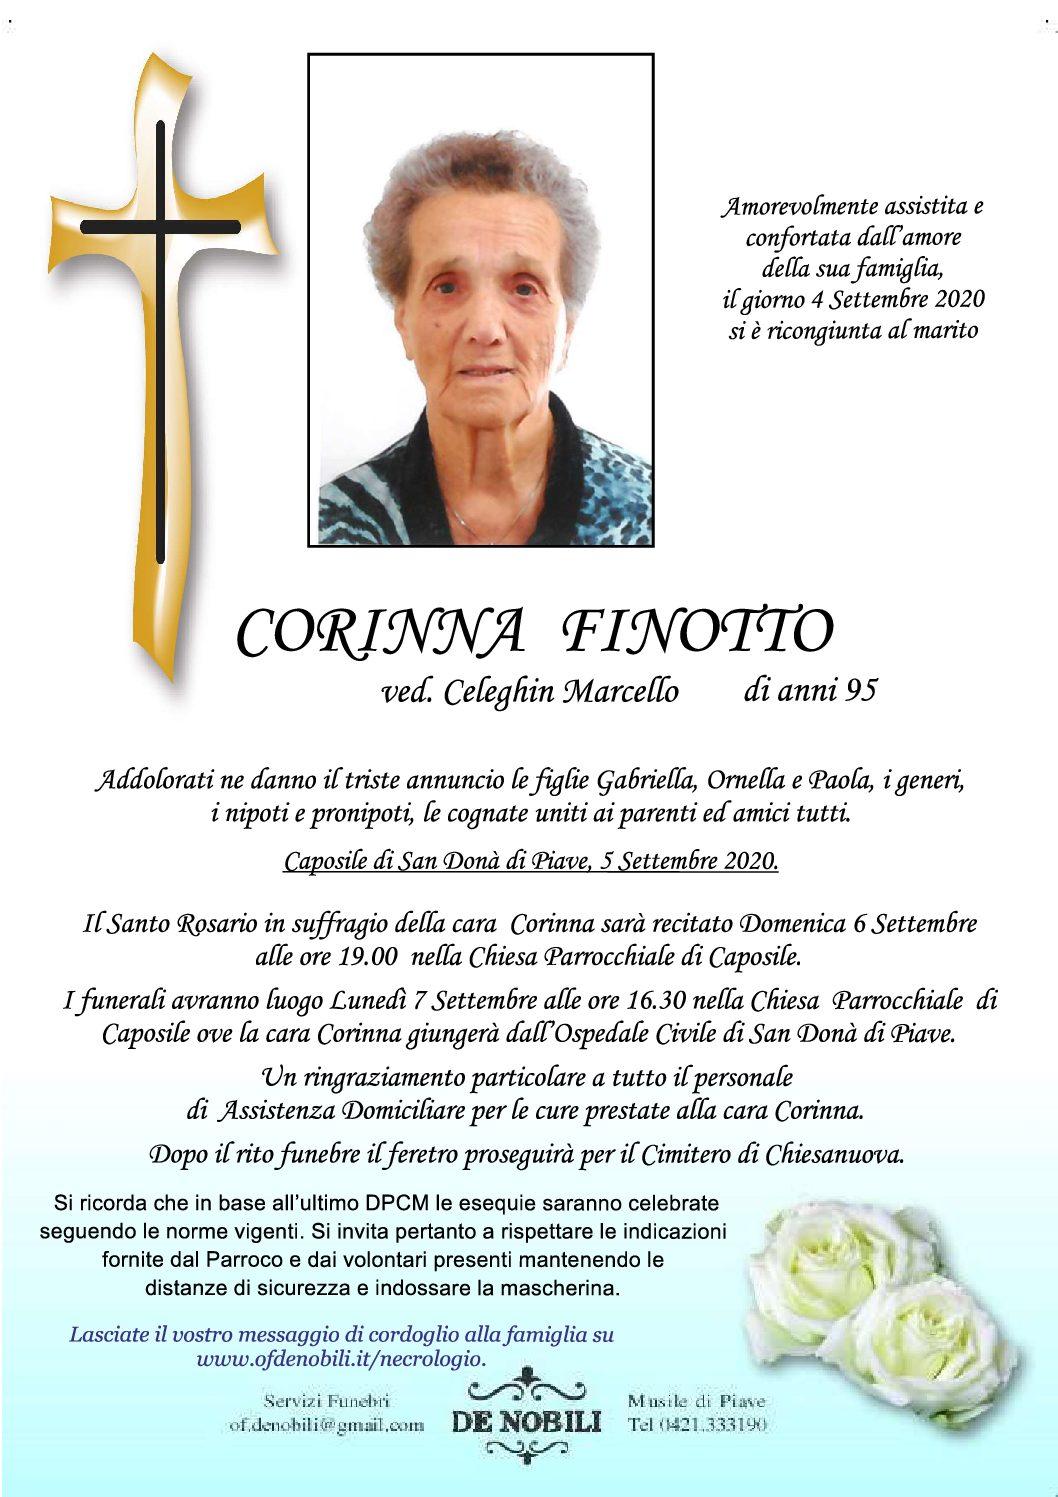 Corina Finotto